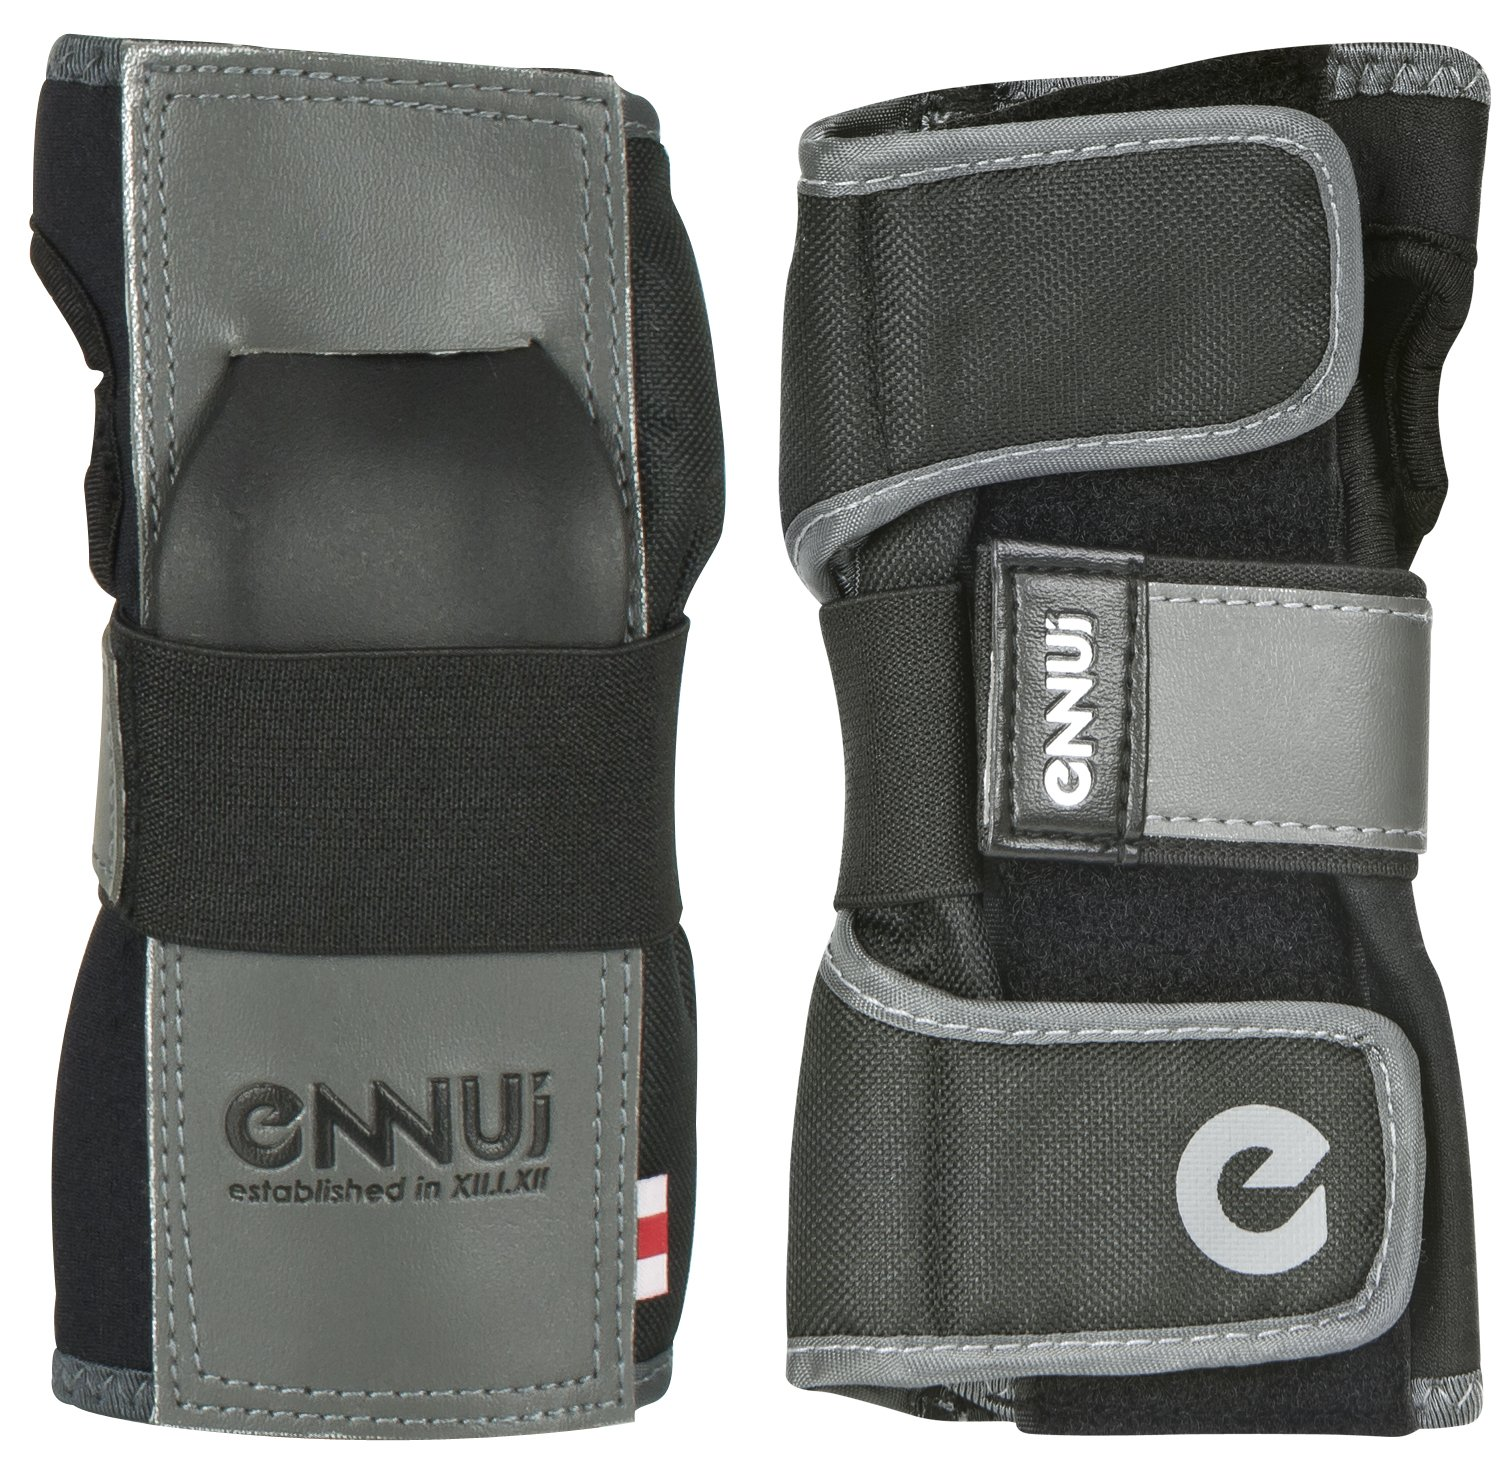 Ennui Street Wristguard MD